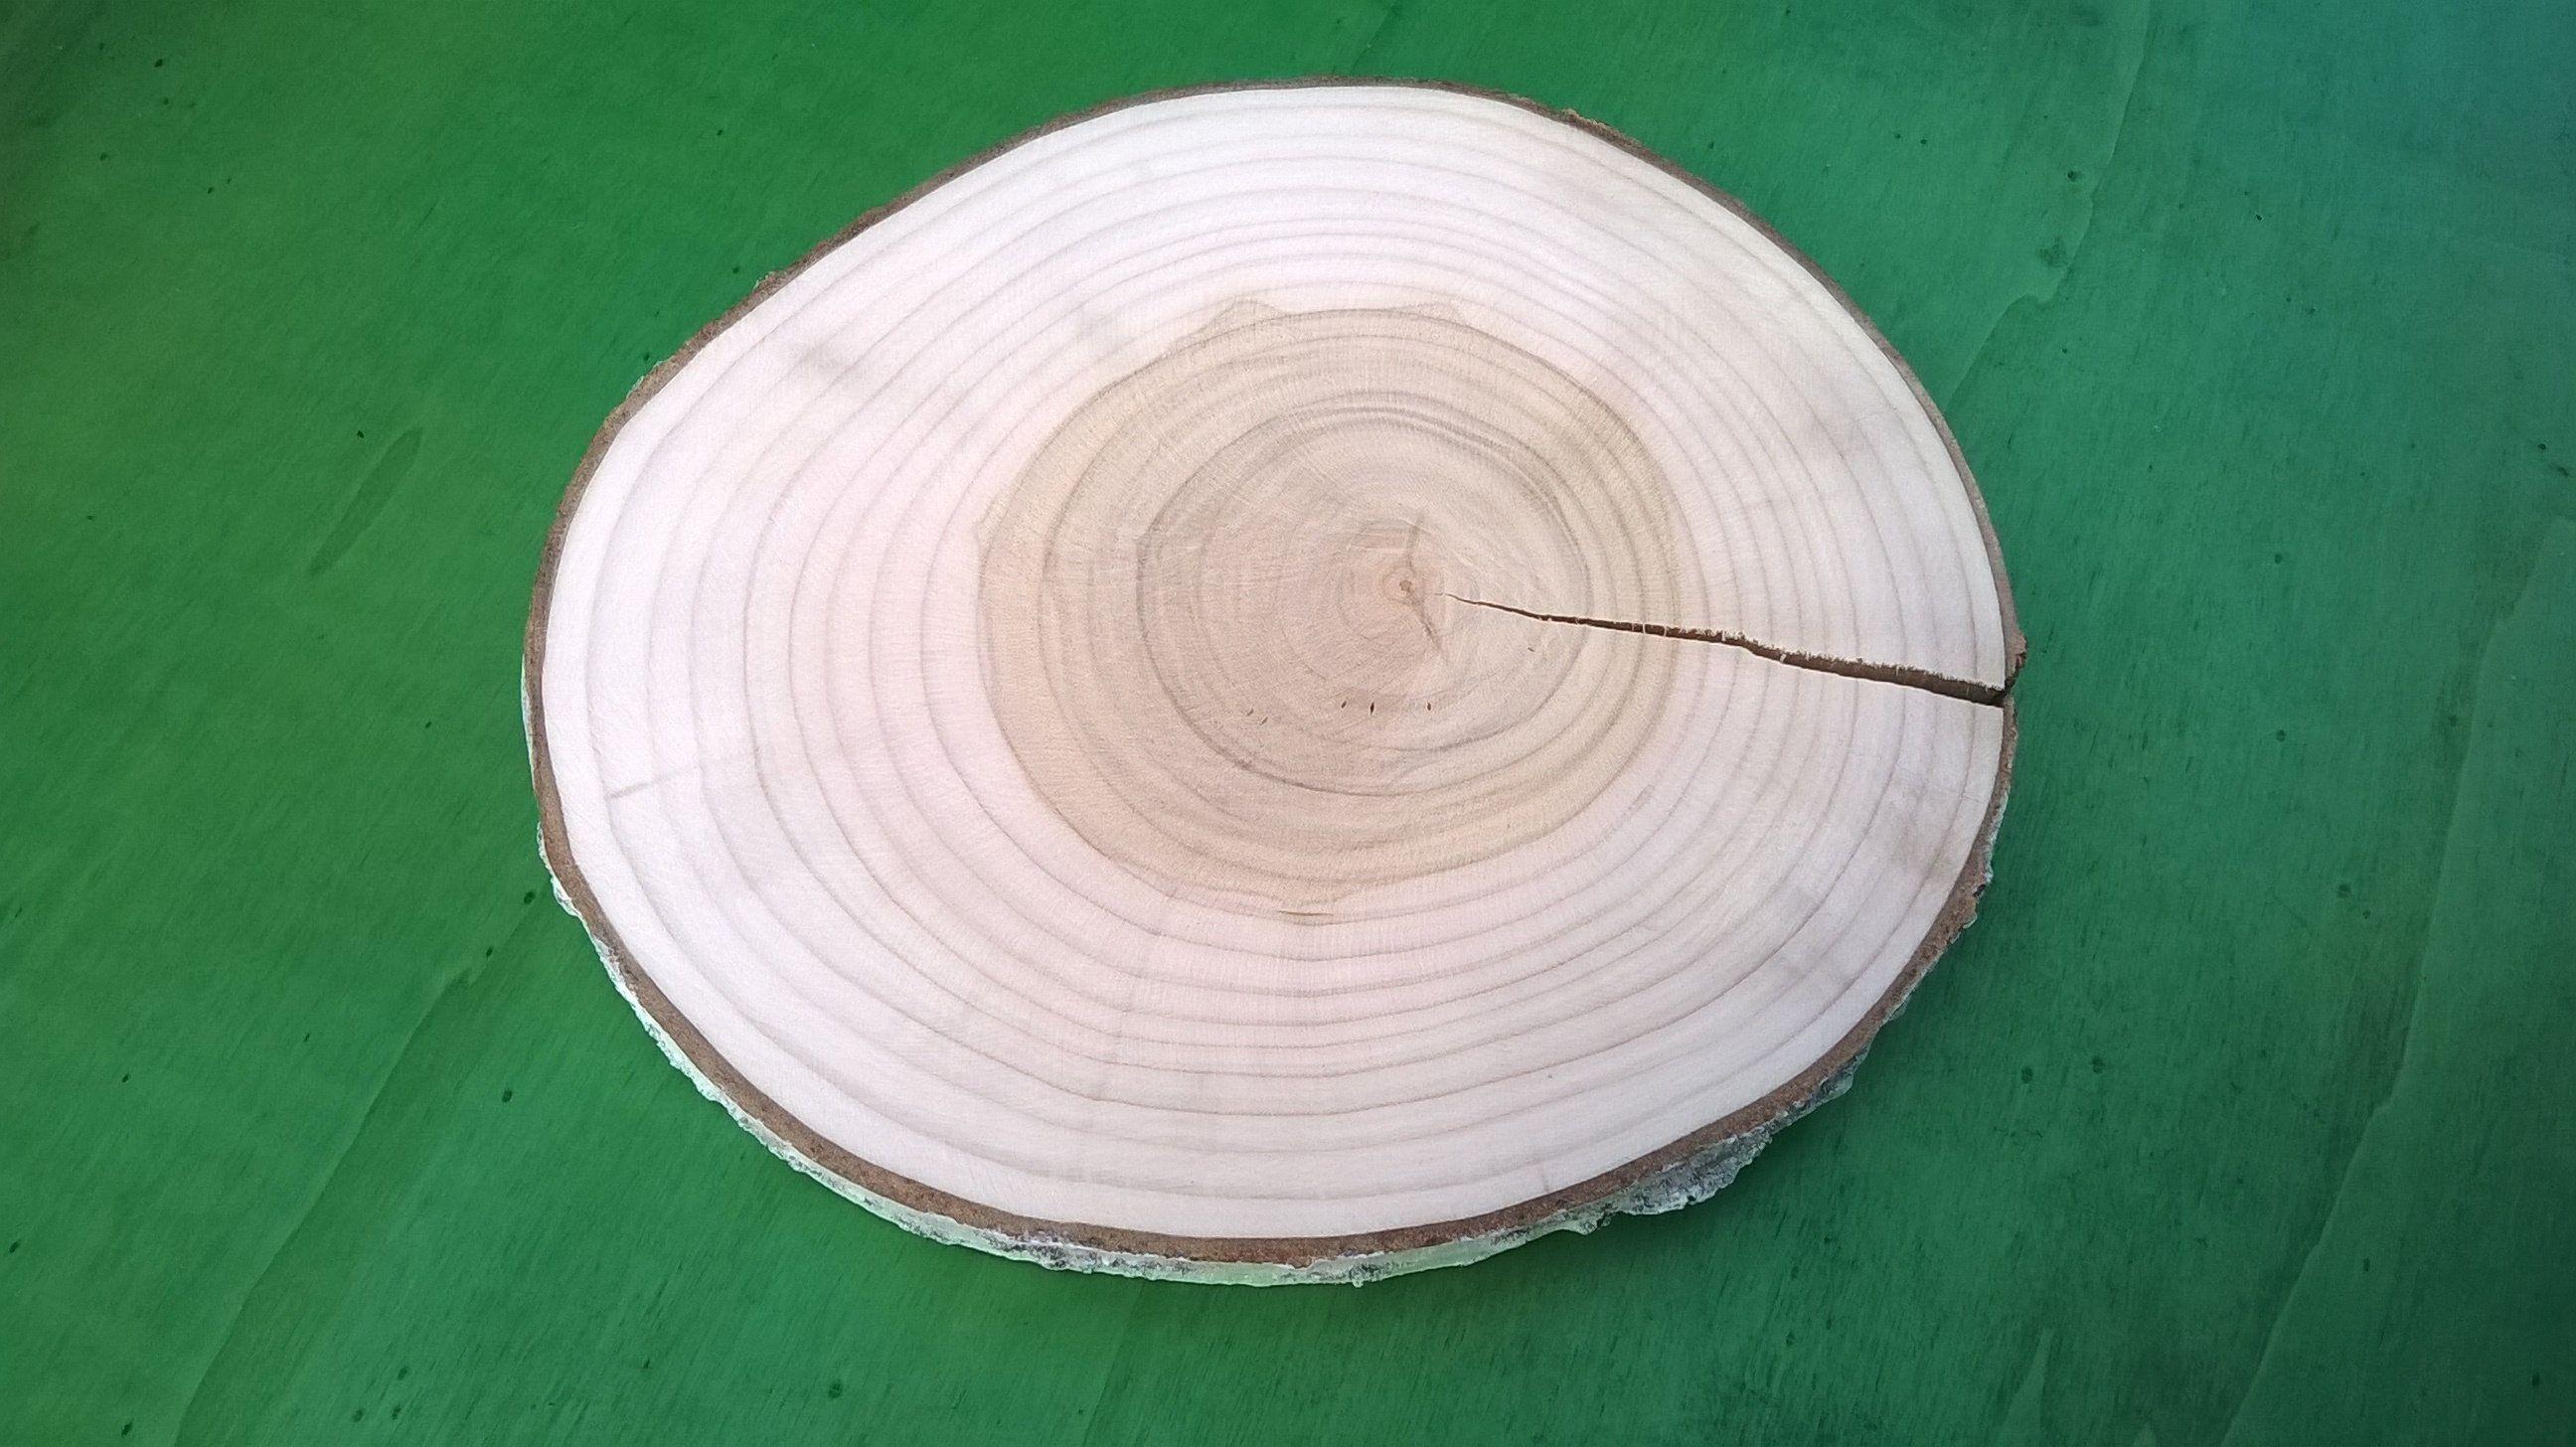 Natural Wood Slices Wood Slice Centerpiece Log Slices Wood Slices Bulk Smooth Wood Slice Sanded Slice Winter Wedding Table Decor In 2020 Wood Slice Centerpiece Wood Slices Wood Slice Ornament